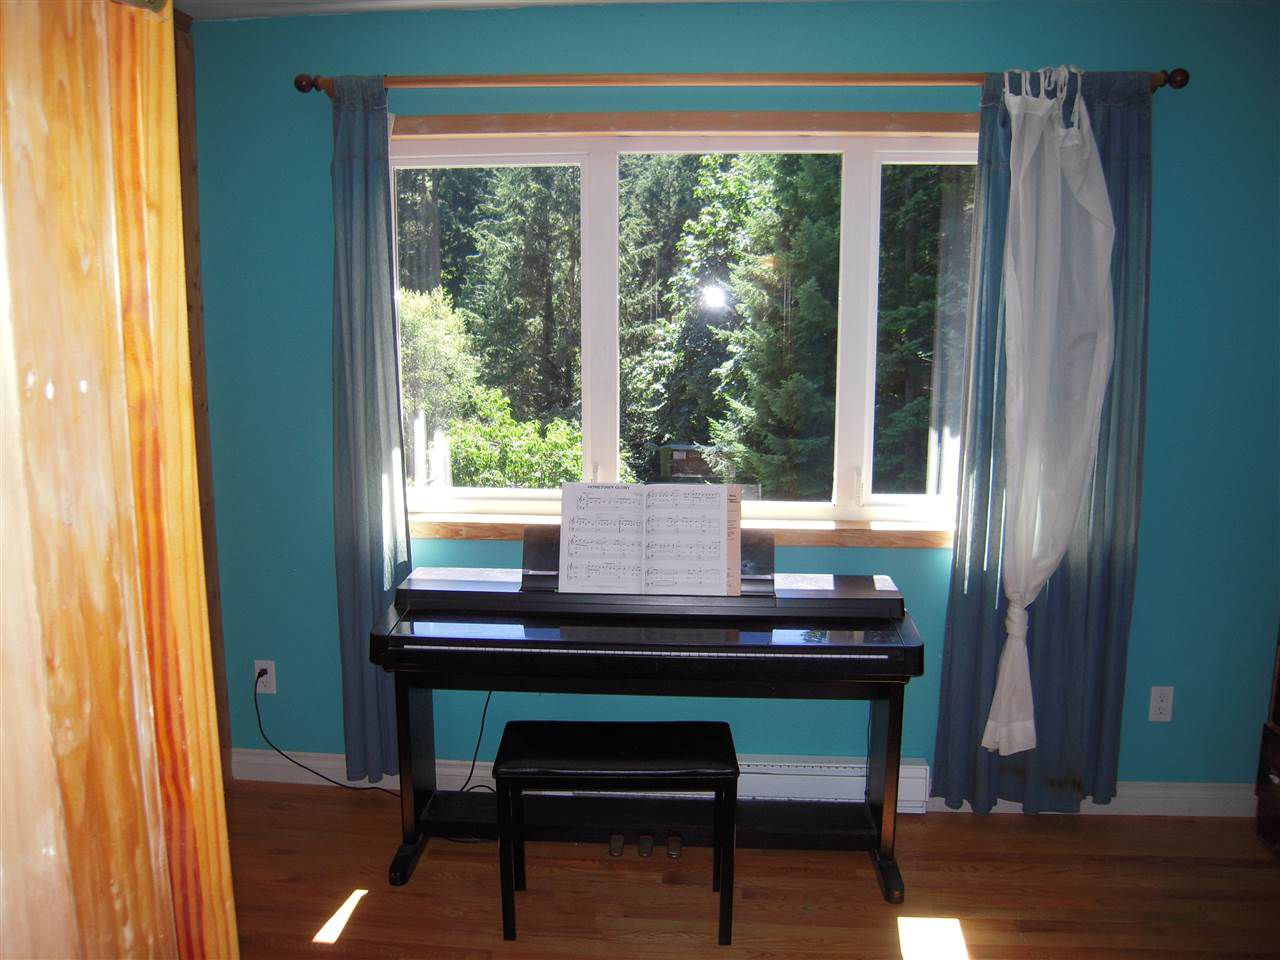 Photo 14: Photos: 2670 LOWER Road: Roberts Creek House for sale (Sunshine Coast)  : MLS®# R2096275